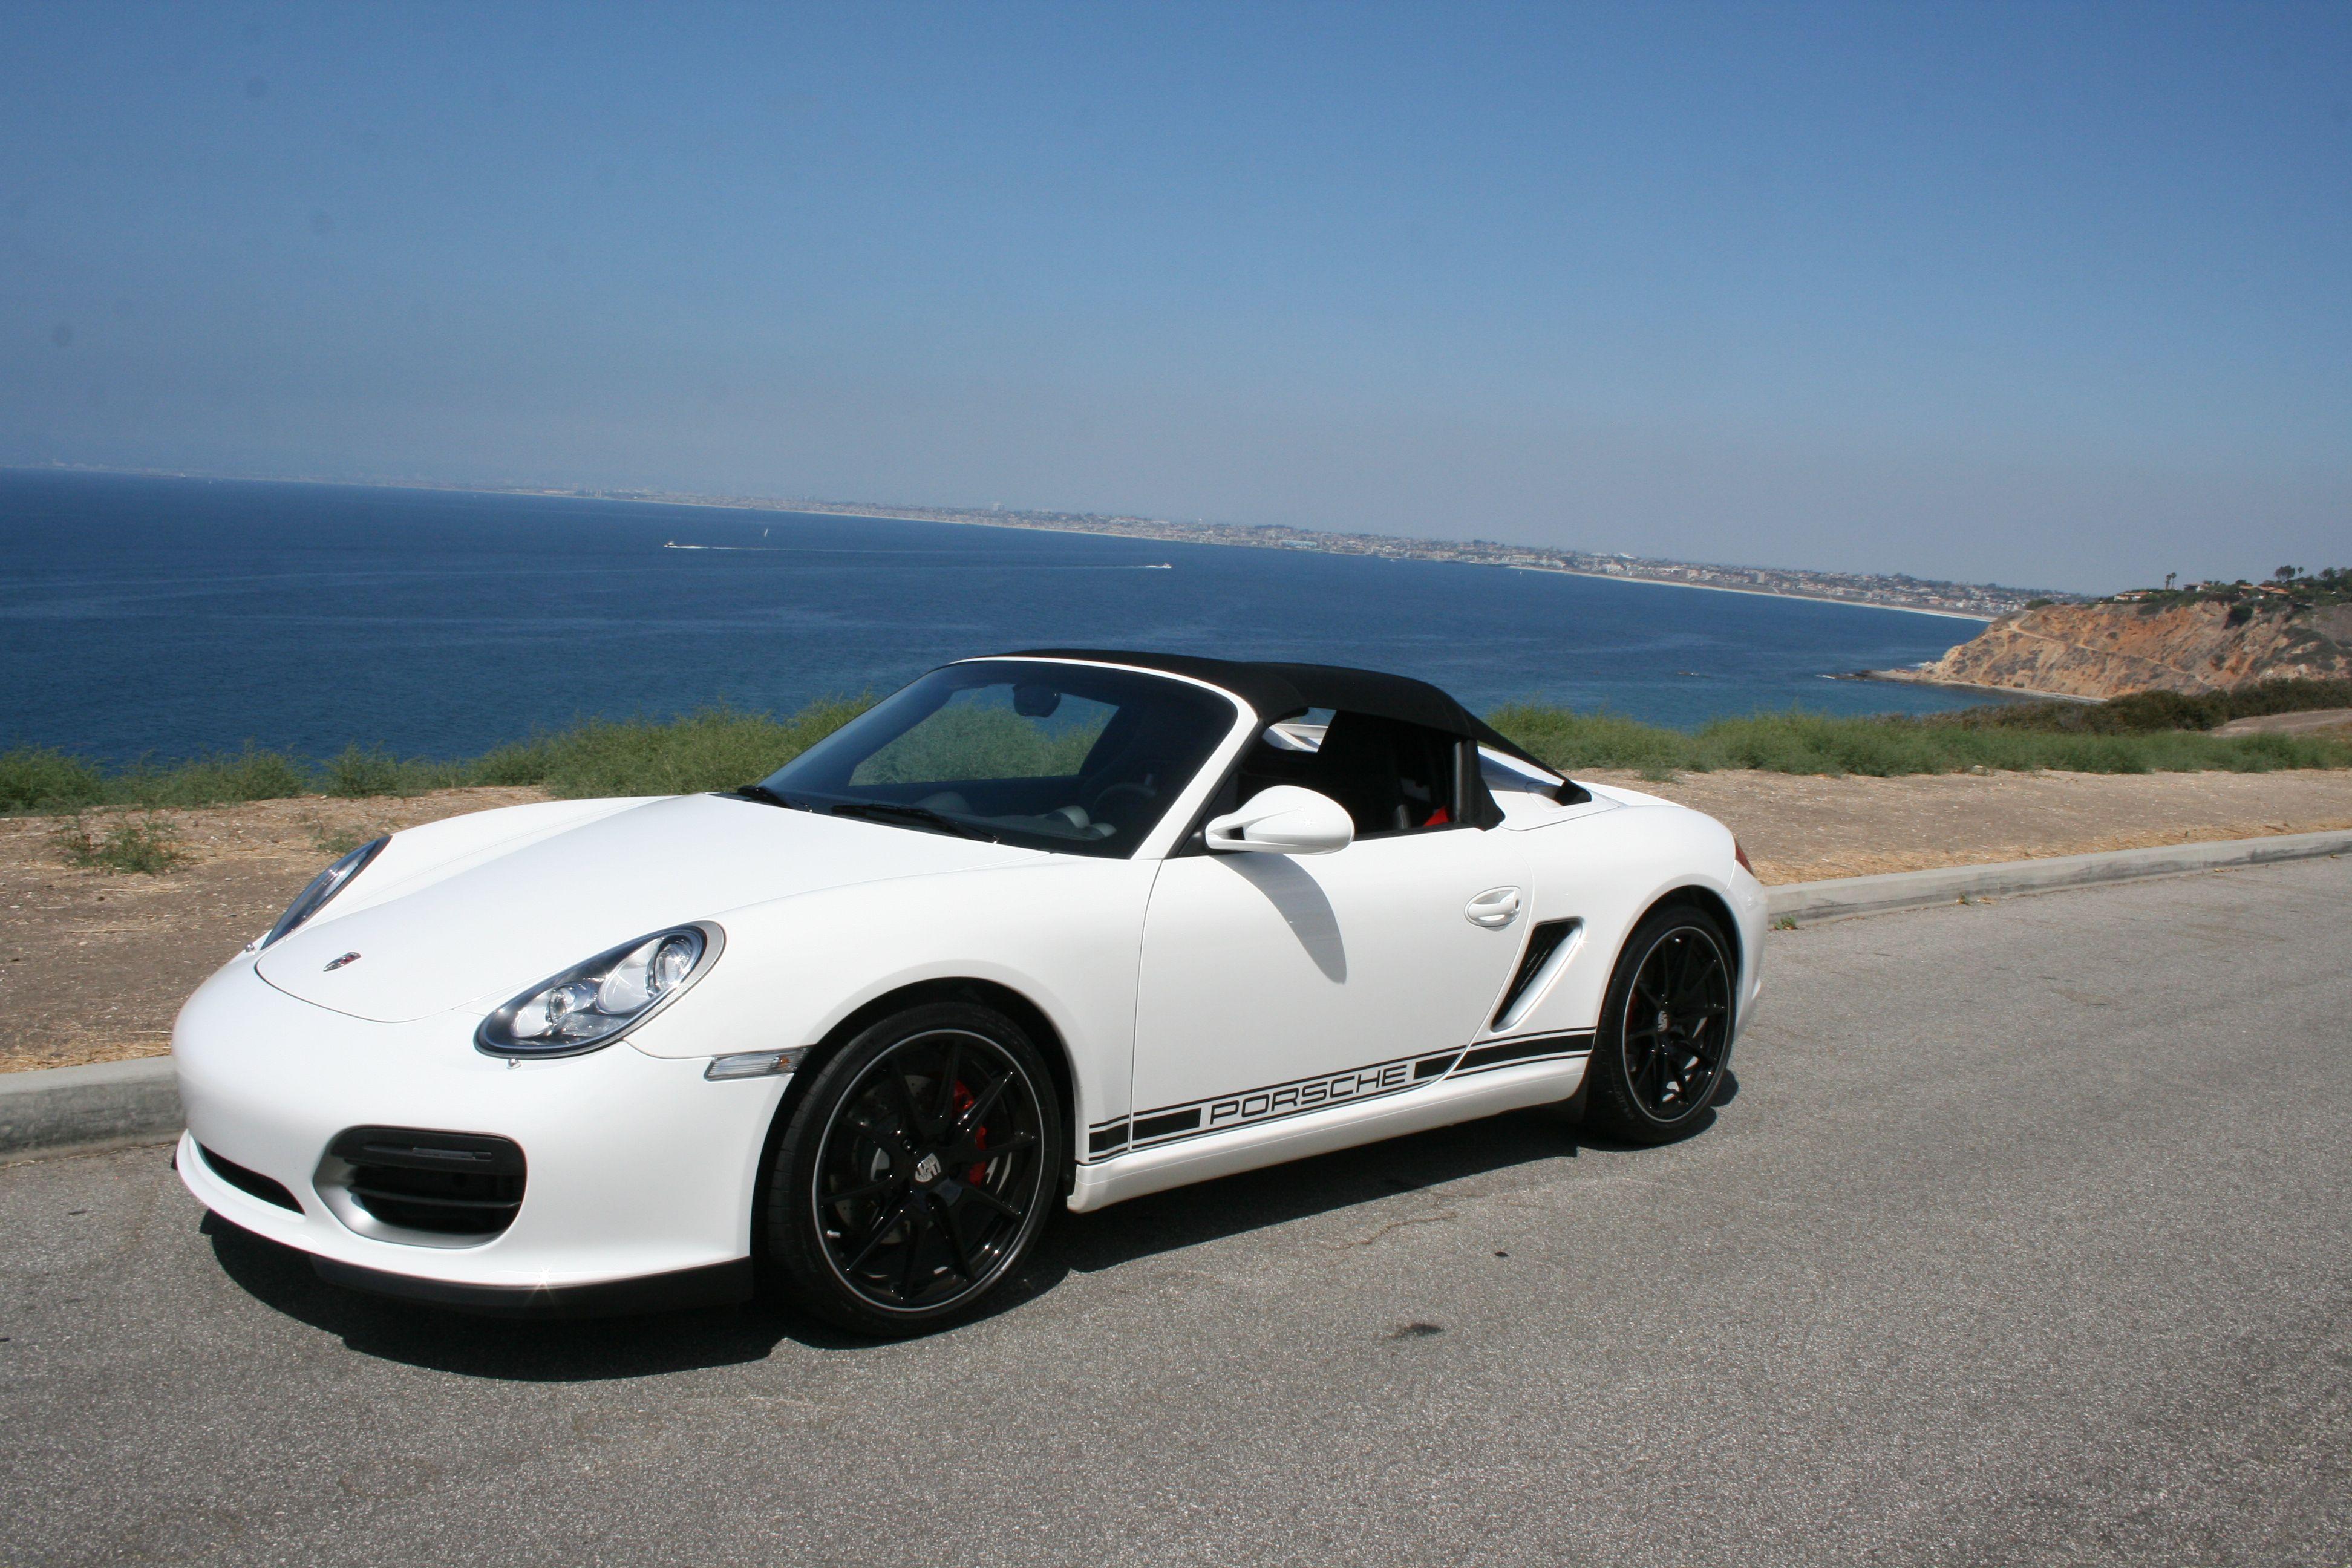 f22534cc062df6b47ad715018e20083f Stunning Ficha Tecnica Porsche 918 Spyder Concept Cars Trend